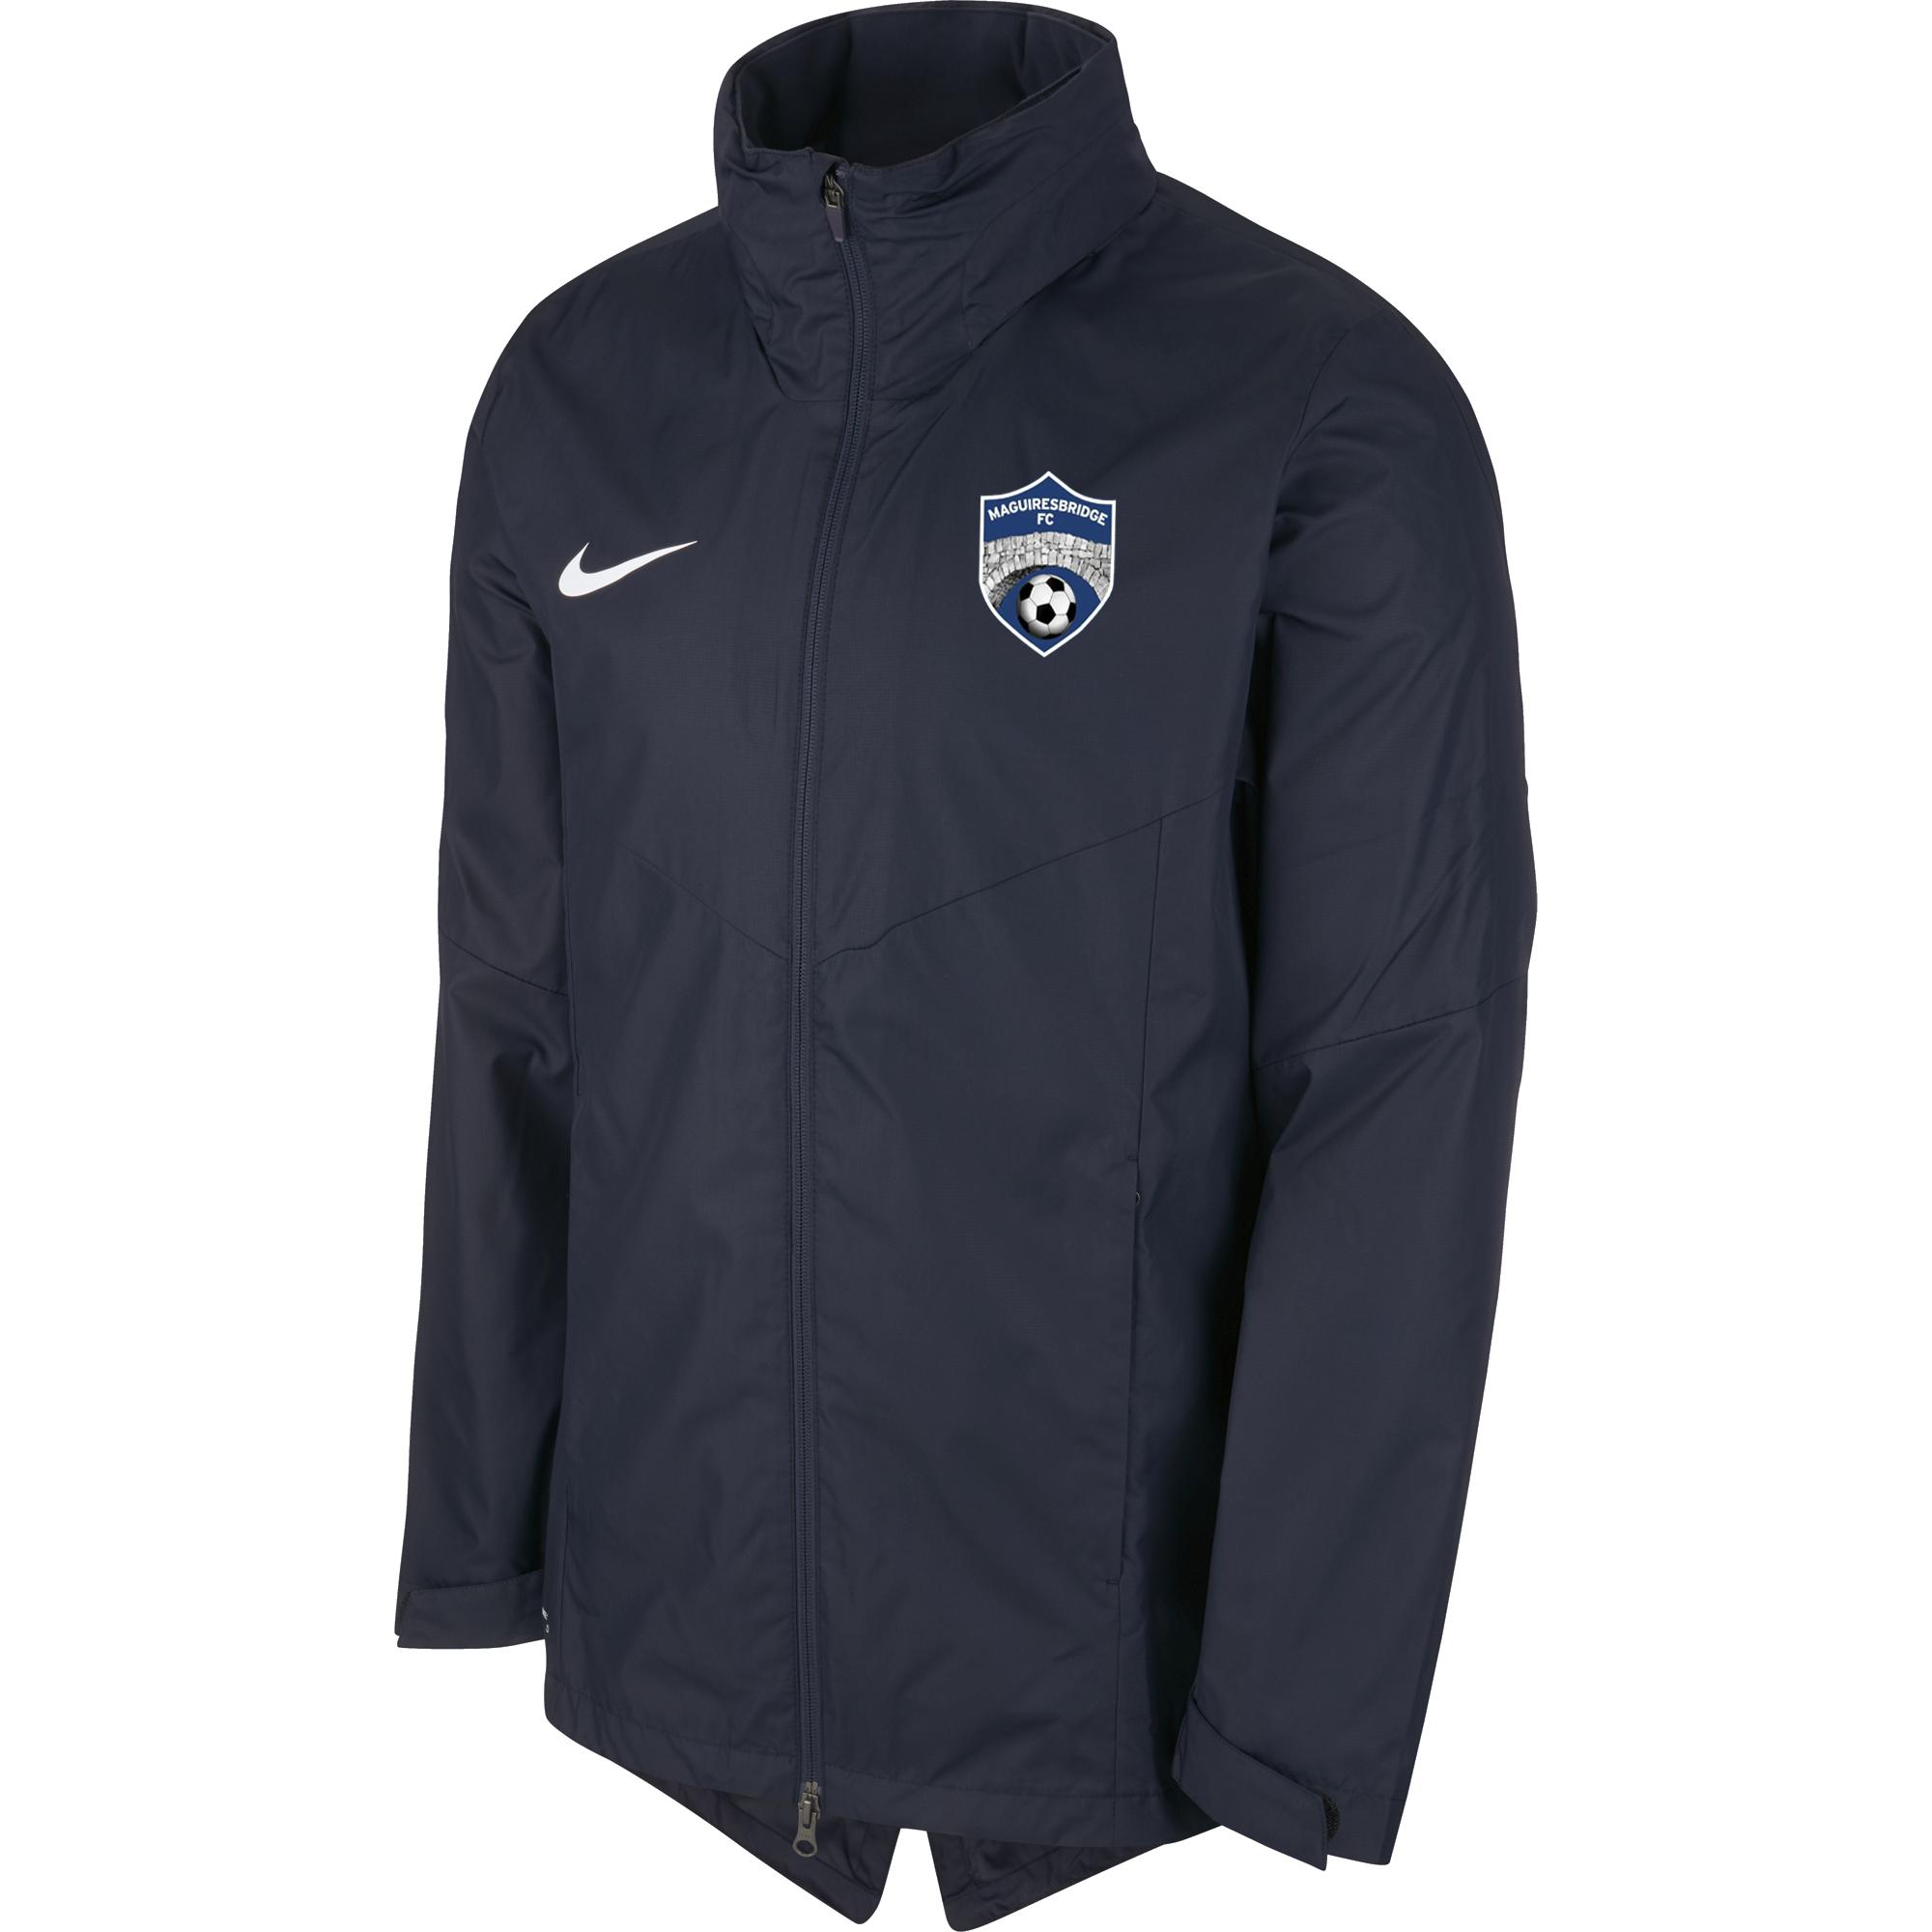 maguiresbridge fc academy rain jacket navy 35581 p